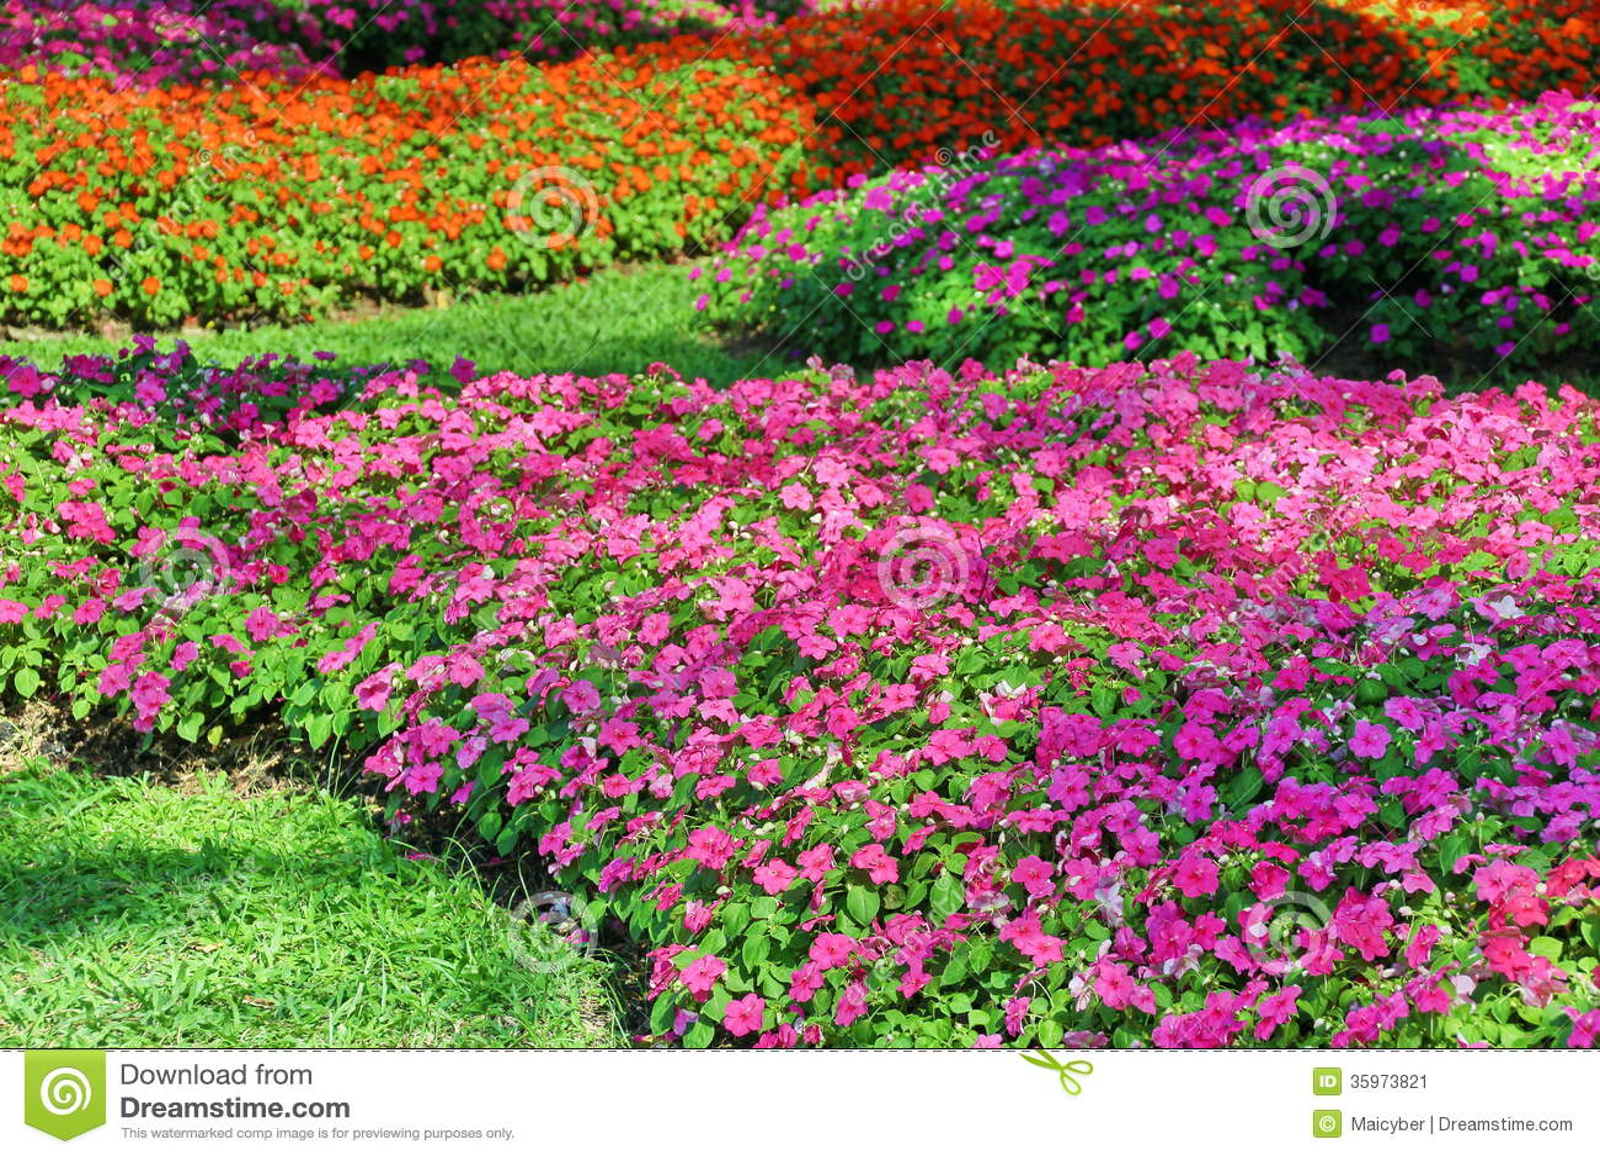 Periwinkle Flower Stock Image - Image: 35973821